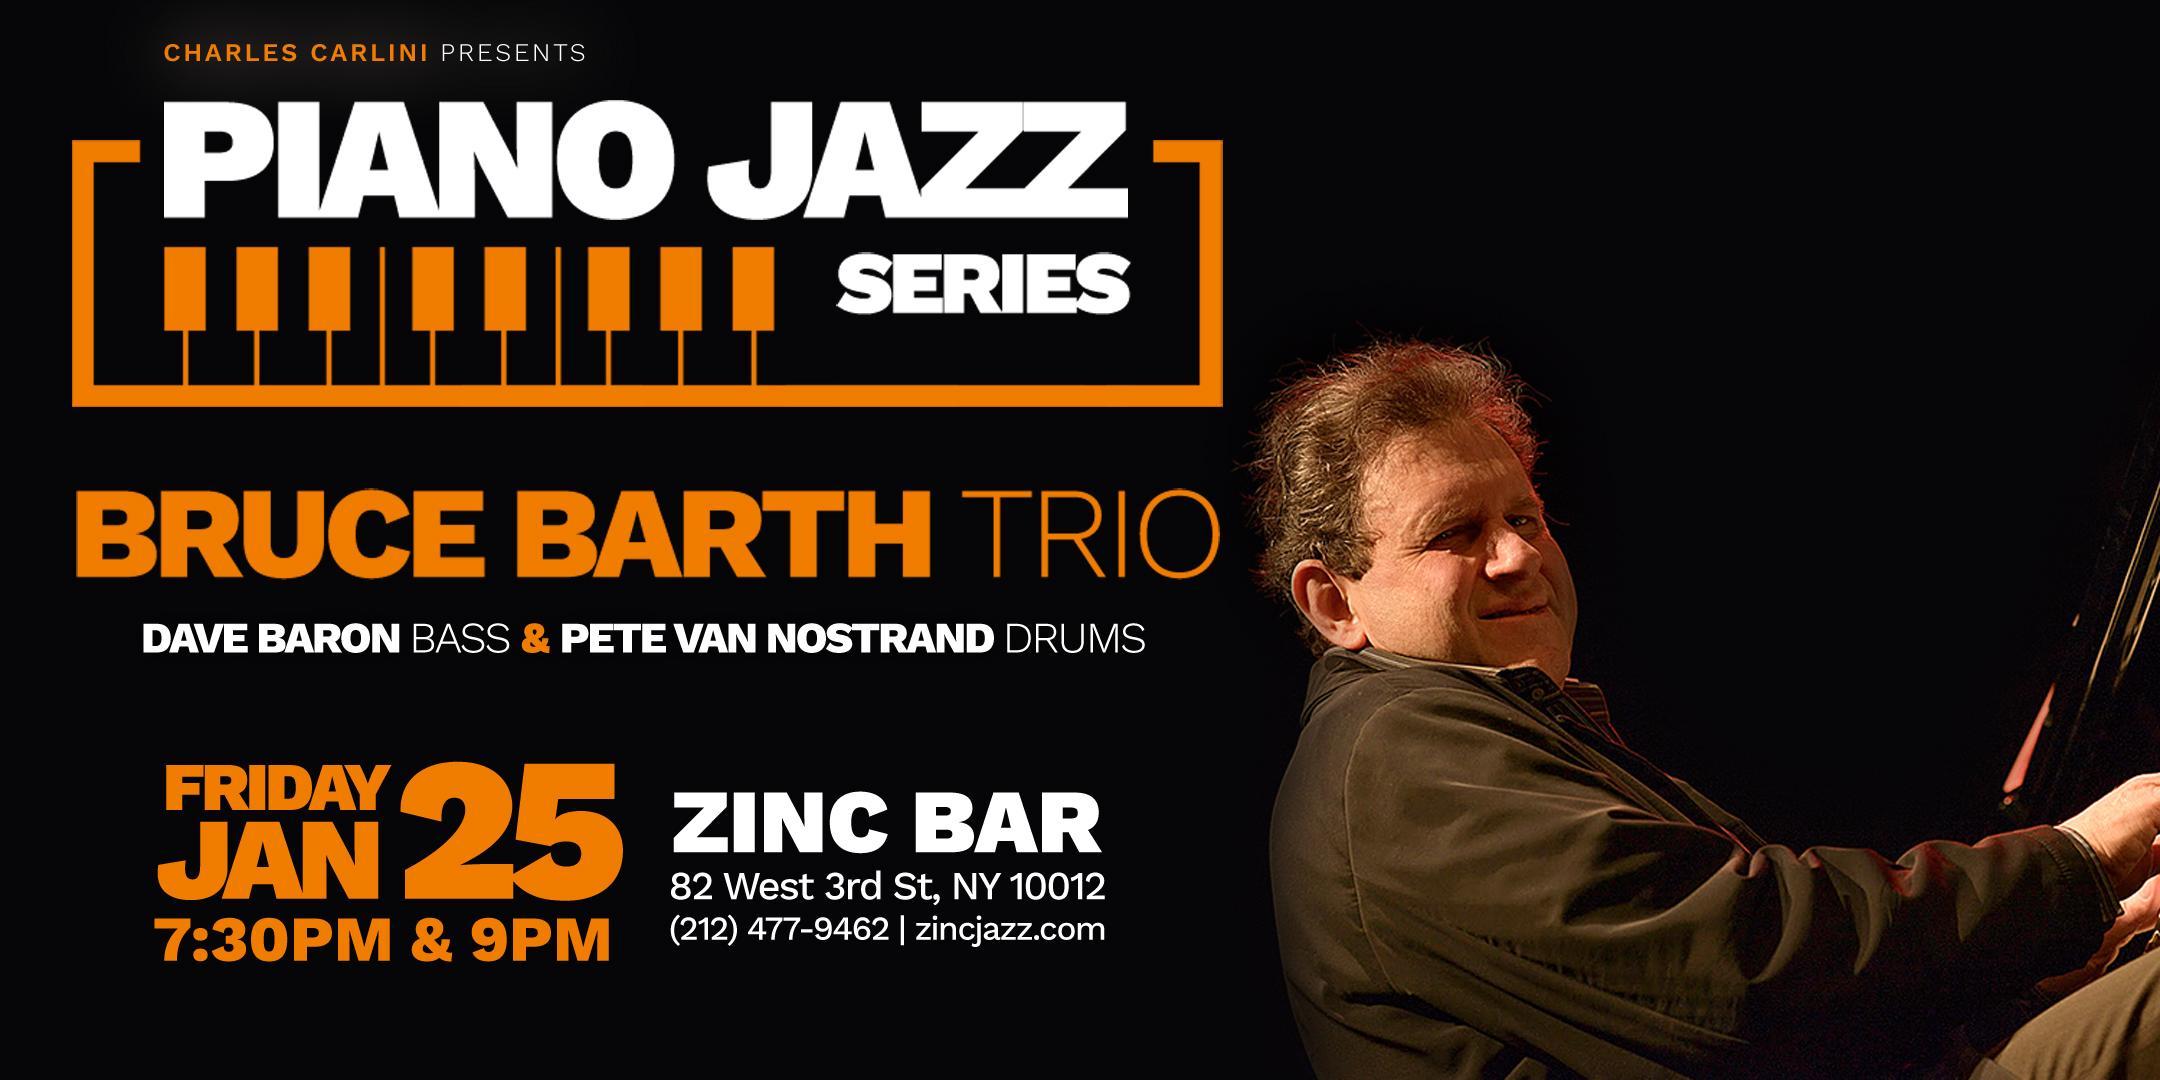 Piano Jazz Series: Bruce Barth Trio